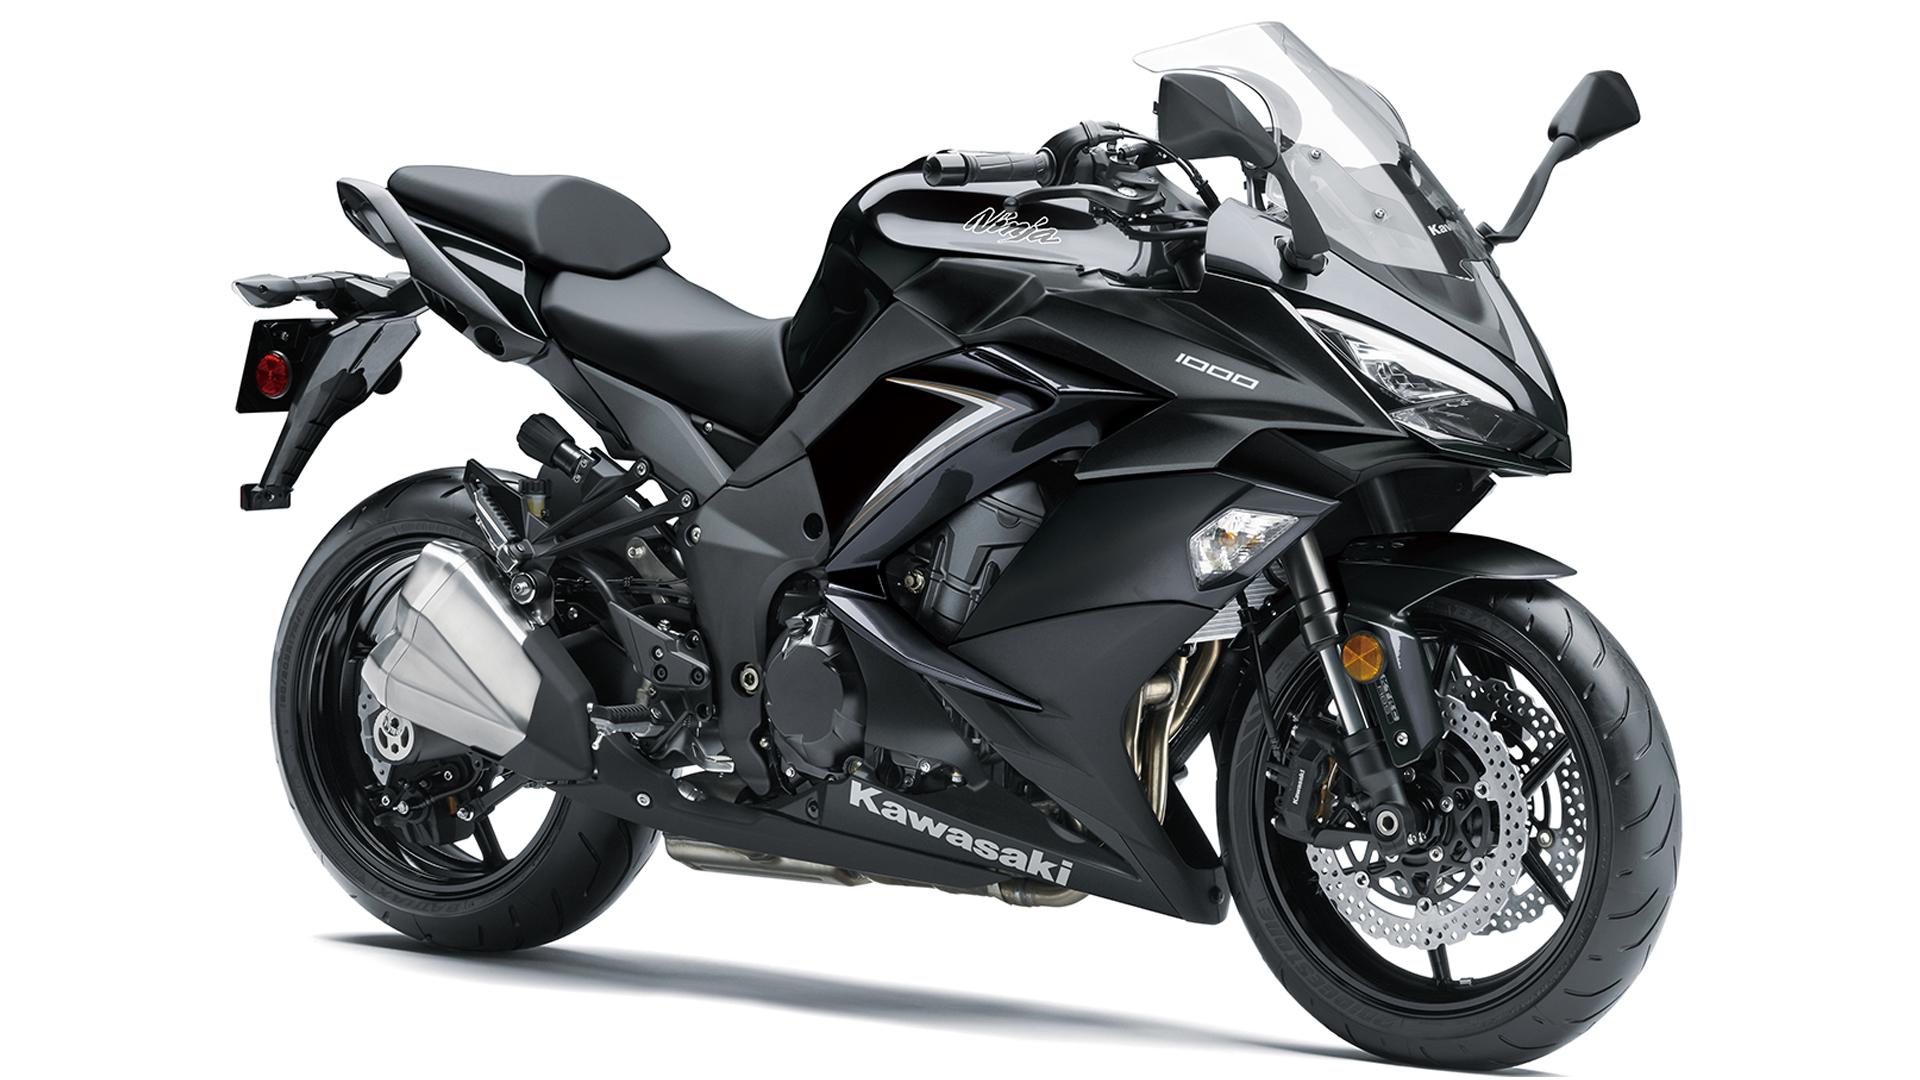 Kawasaki Ninja 1000 2019 STD